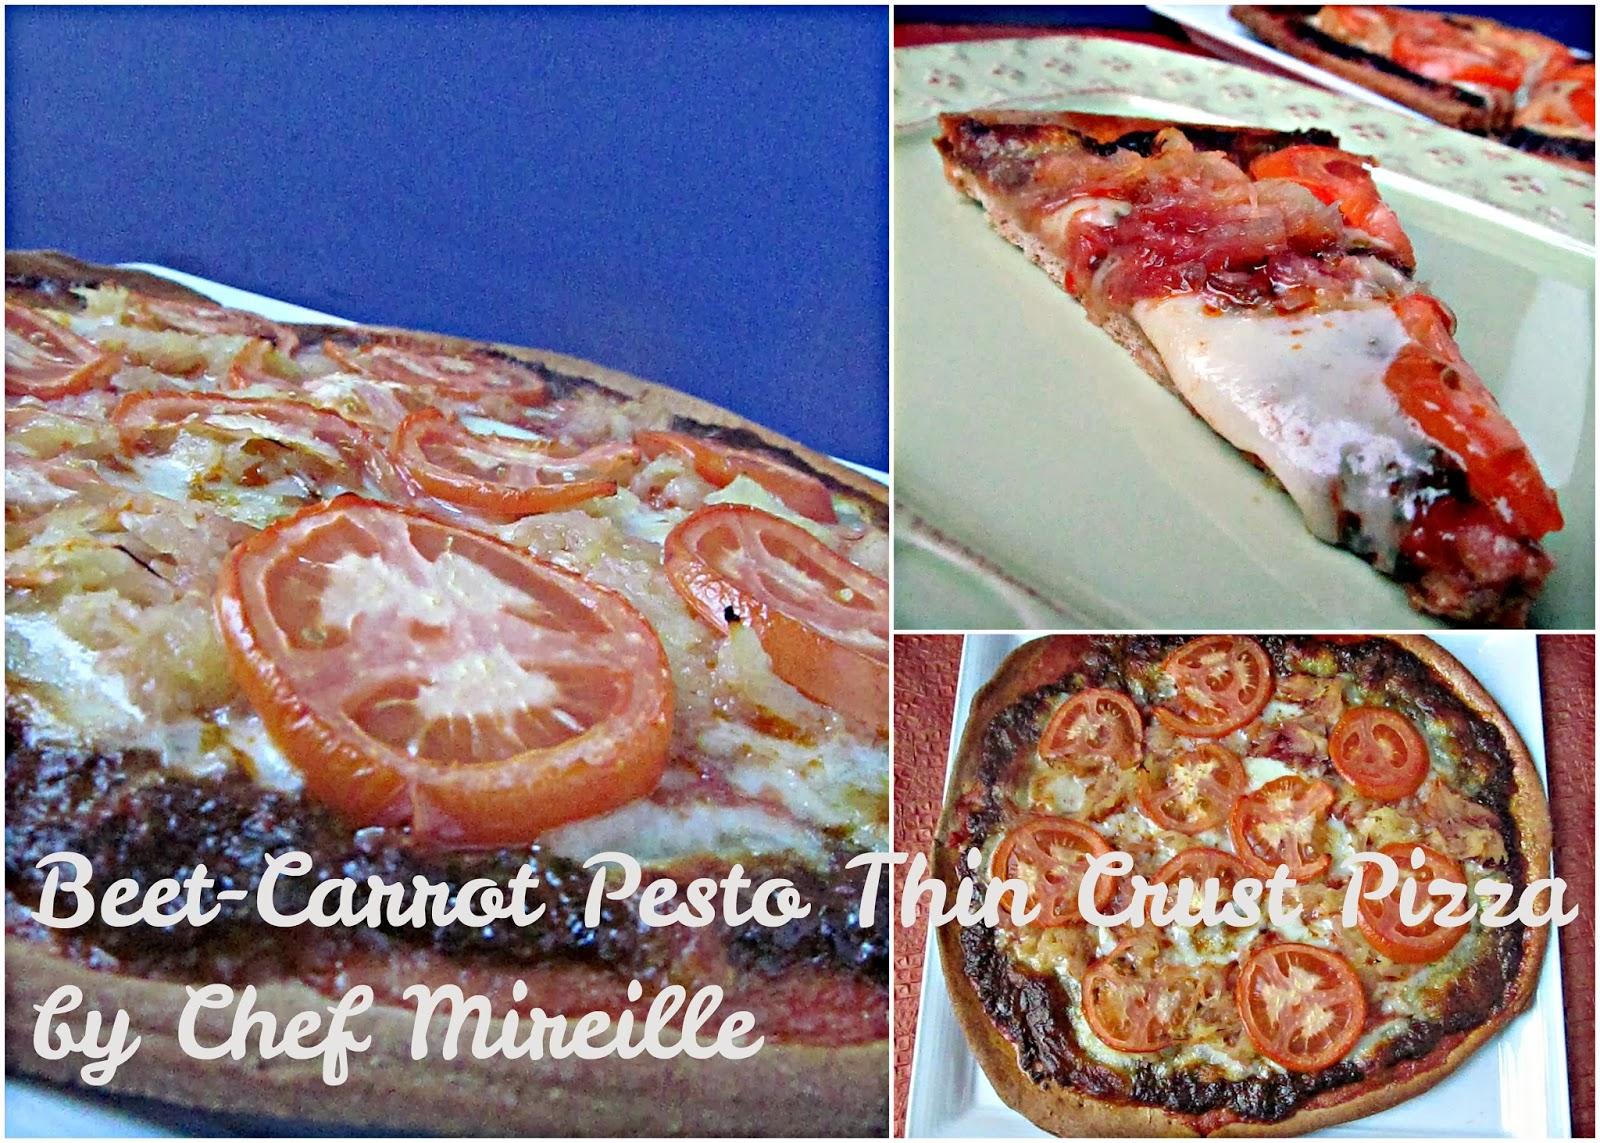 Beet-Carrot Pesto Thin Crust Pizza - The Schizo Chef